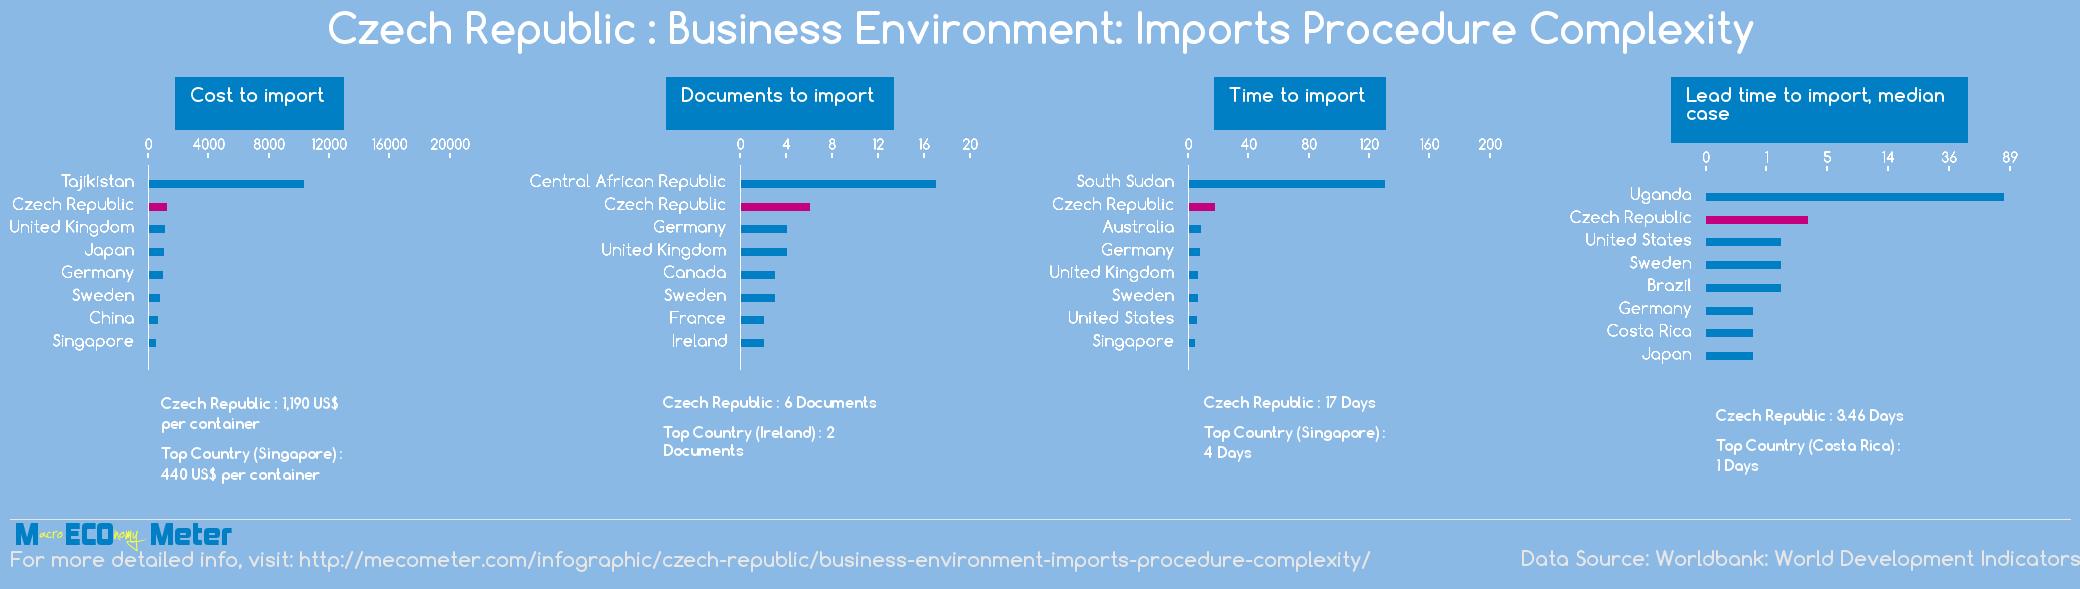 Czech Republic : Business Environment: Imports Procedure Complexity